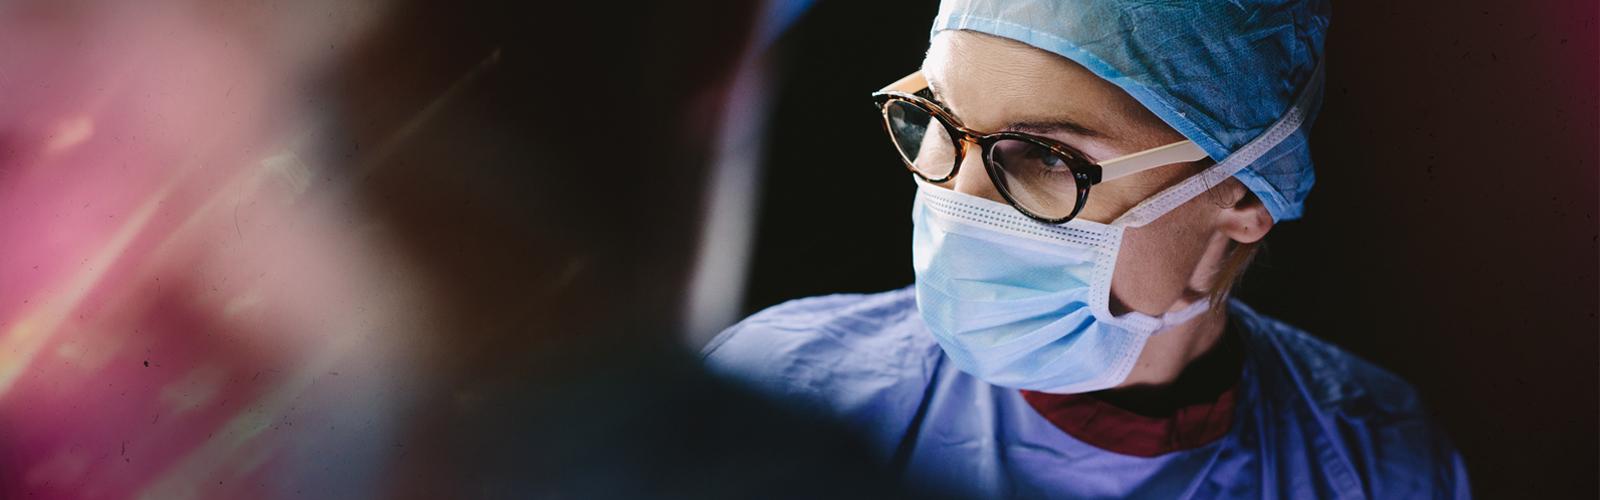 Medico in una sala operatoria